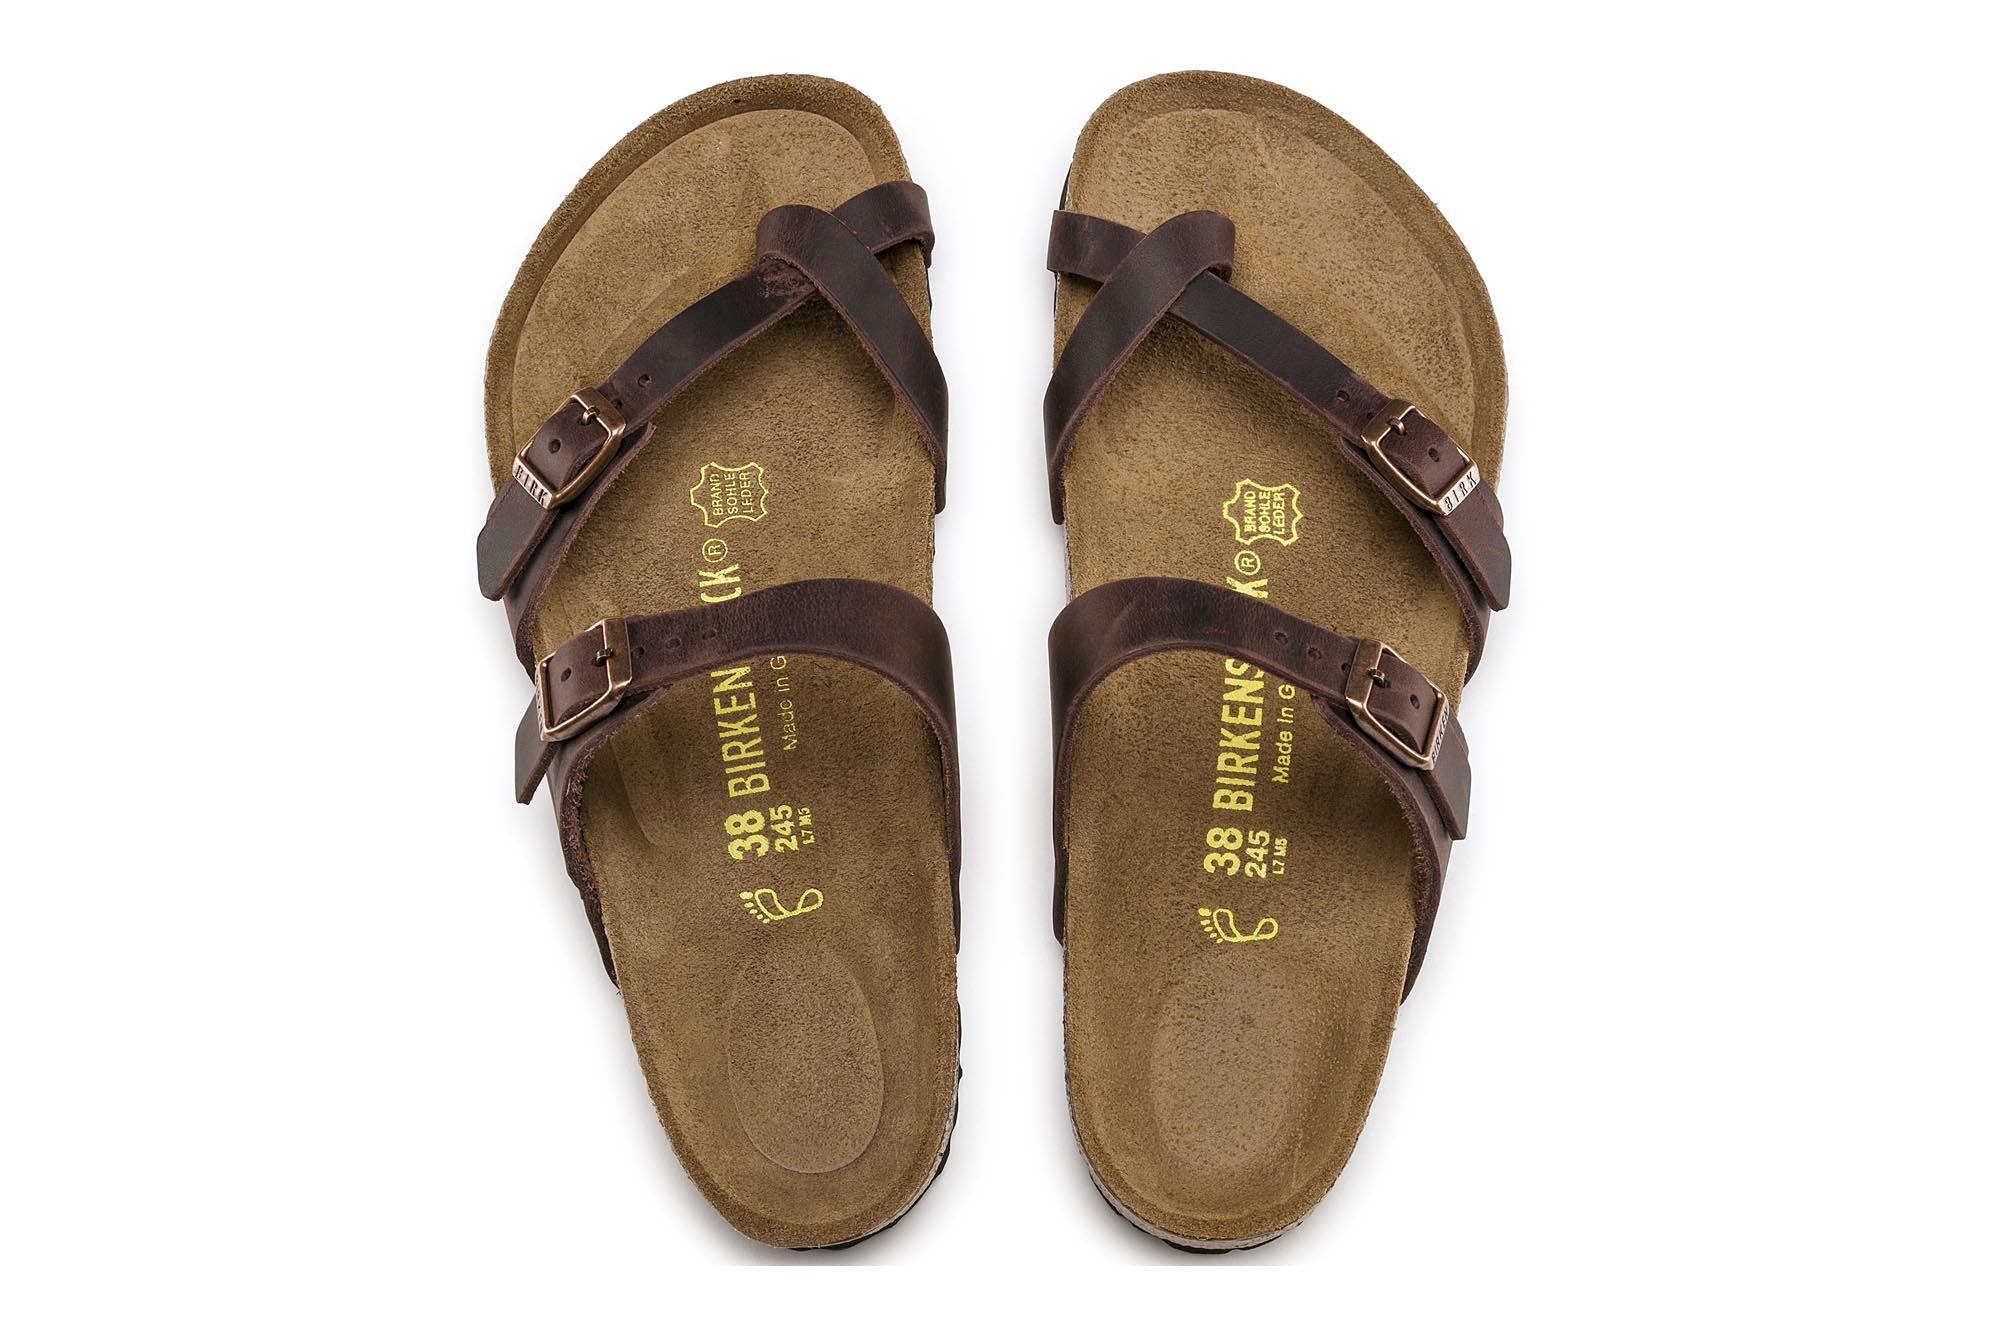 Birkenstock Oiled Leather Mayari Sandal In Havana Brown Color Size 41 125 00